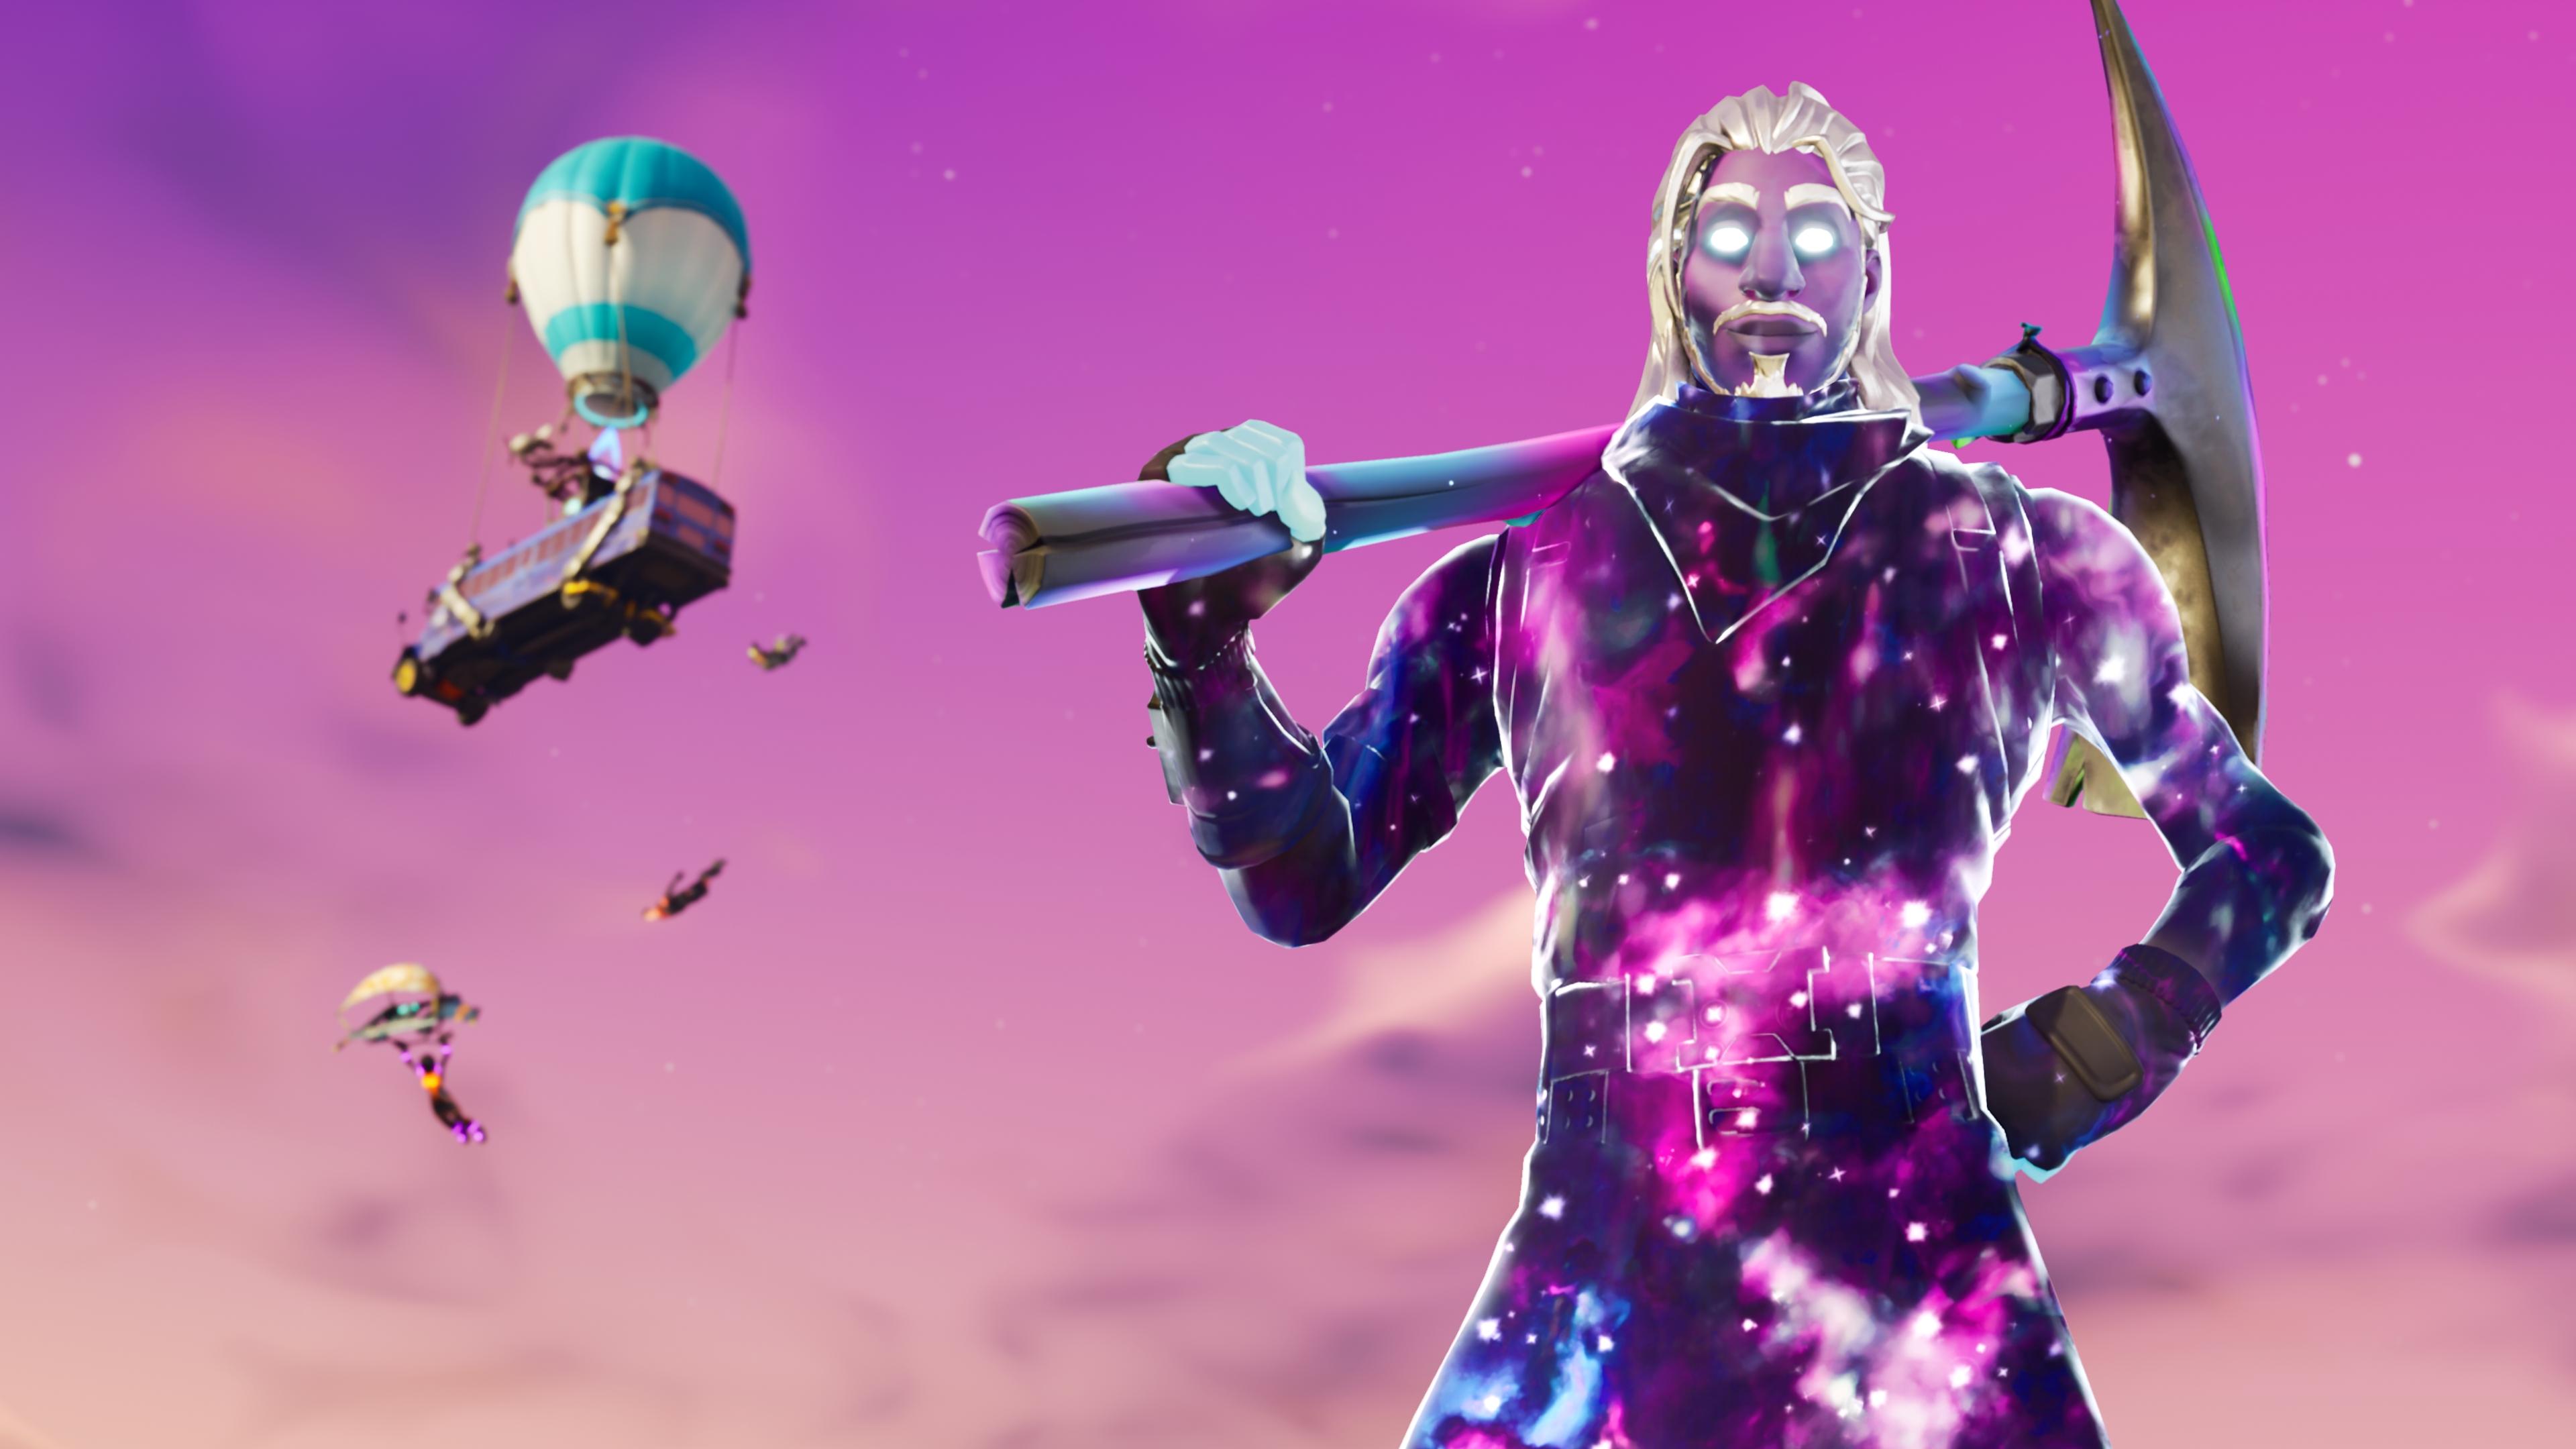 Galaxy Man Fortnite Season 6 4K, HD Games, 4k Wallpapers